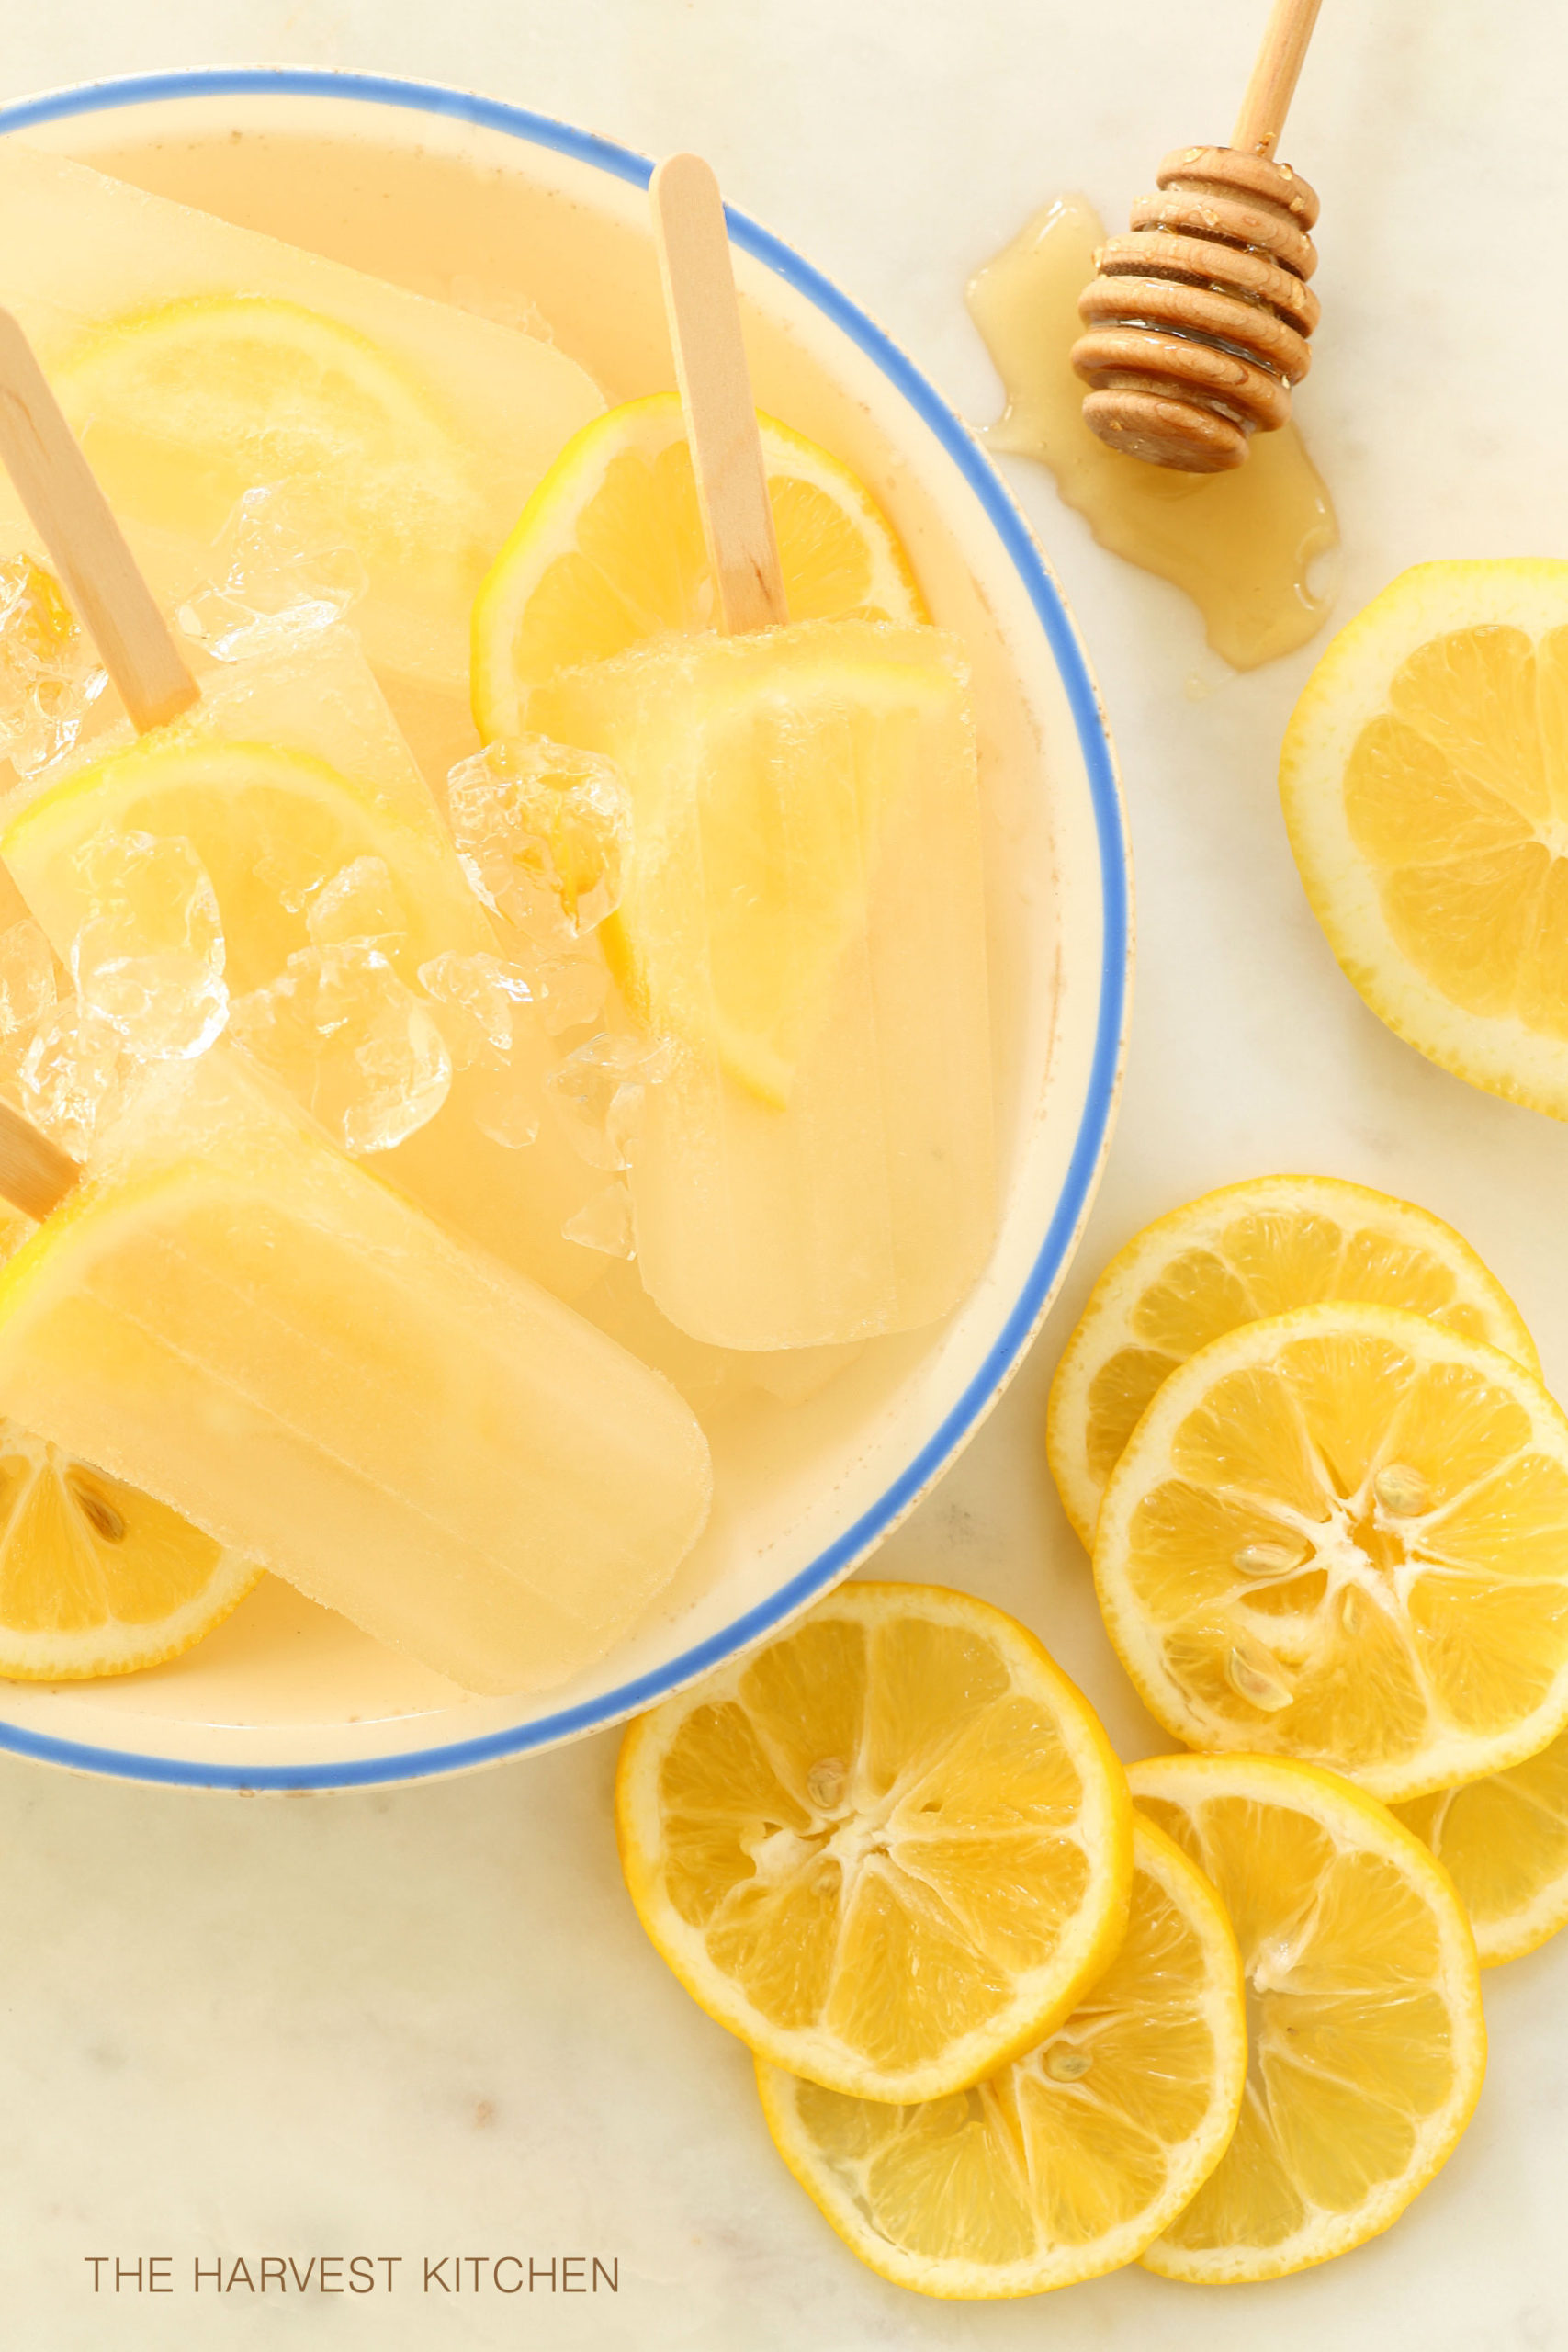 Lemon Ginger Popsicles are made with lemon, ginger, honey and water